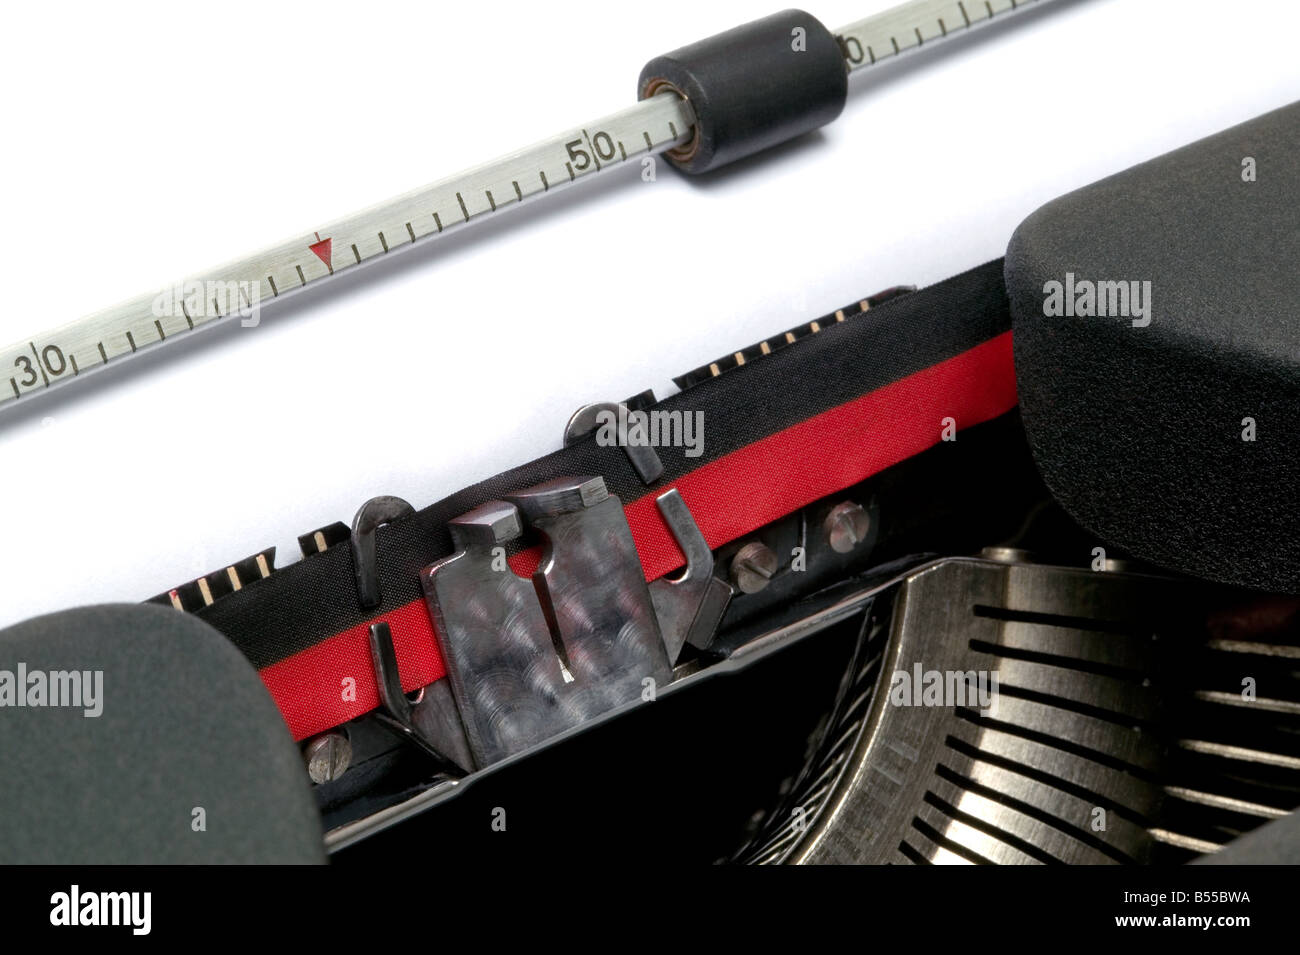 Typewriter close up at an angle - Stock Image